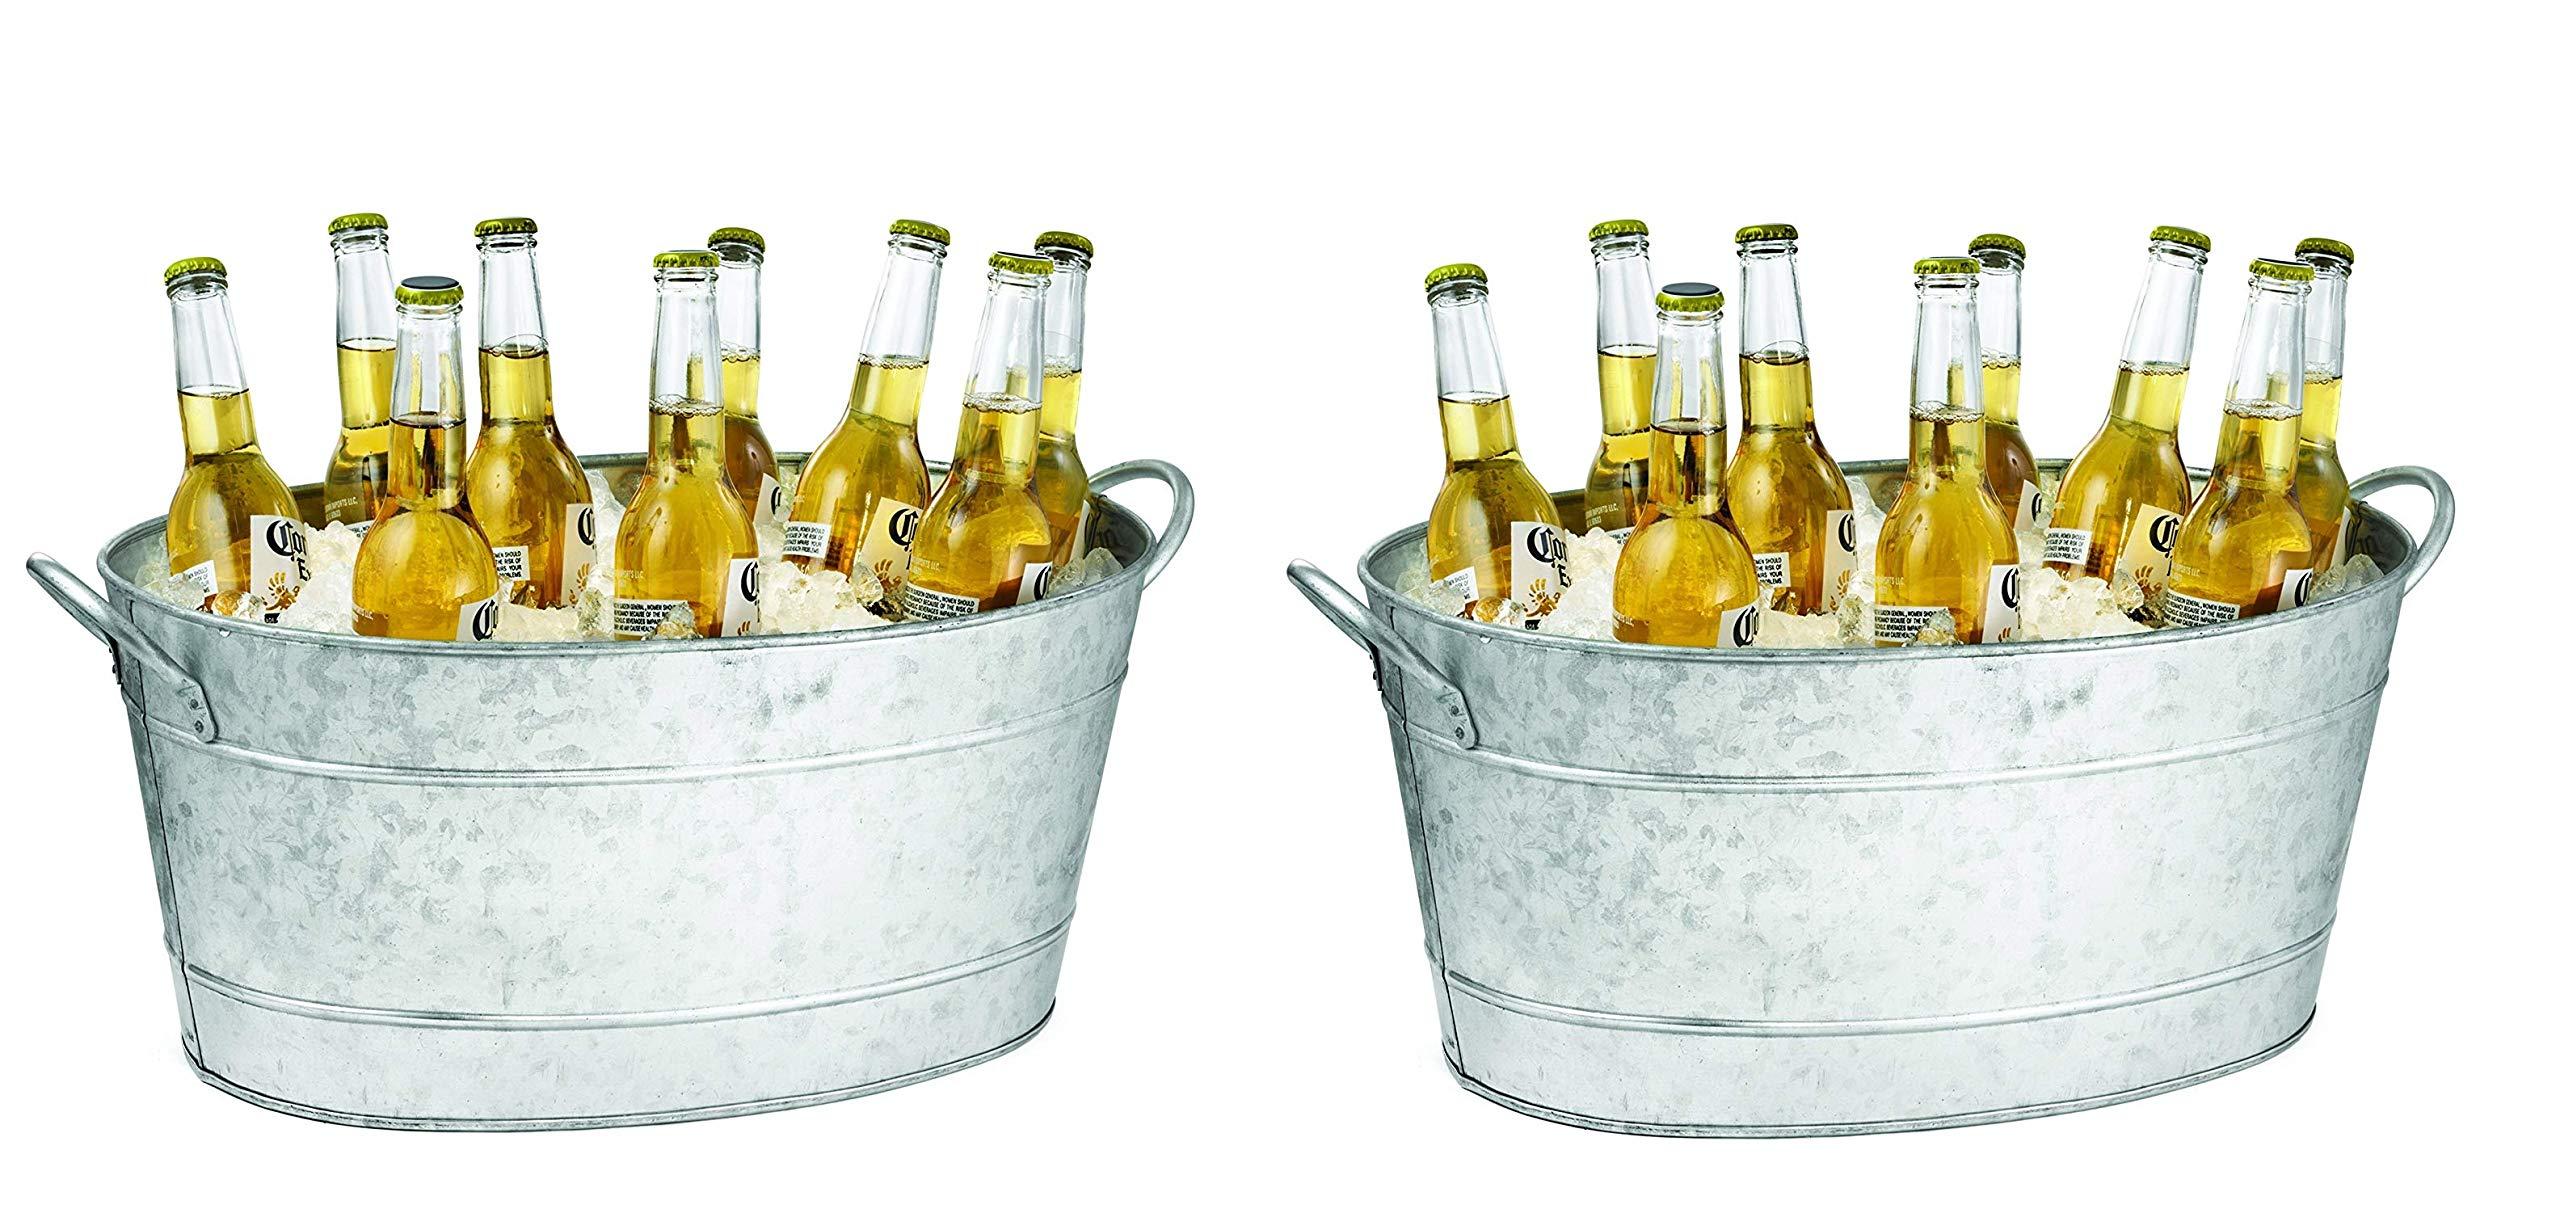 Tablecraft IR 4033 Galvanized Beverage Tub, 5.5 Gallon Silver (Pack of 2)